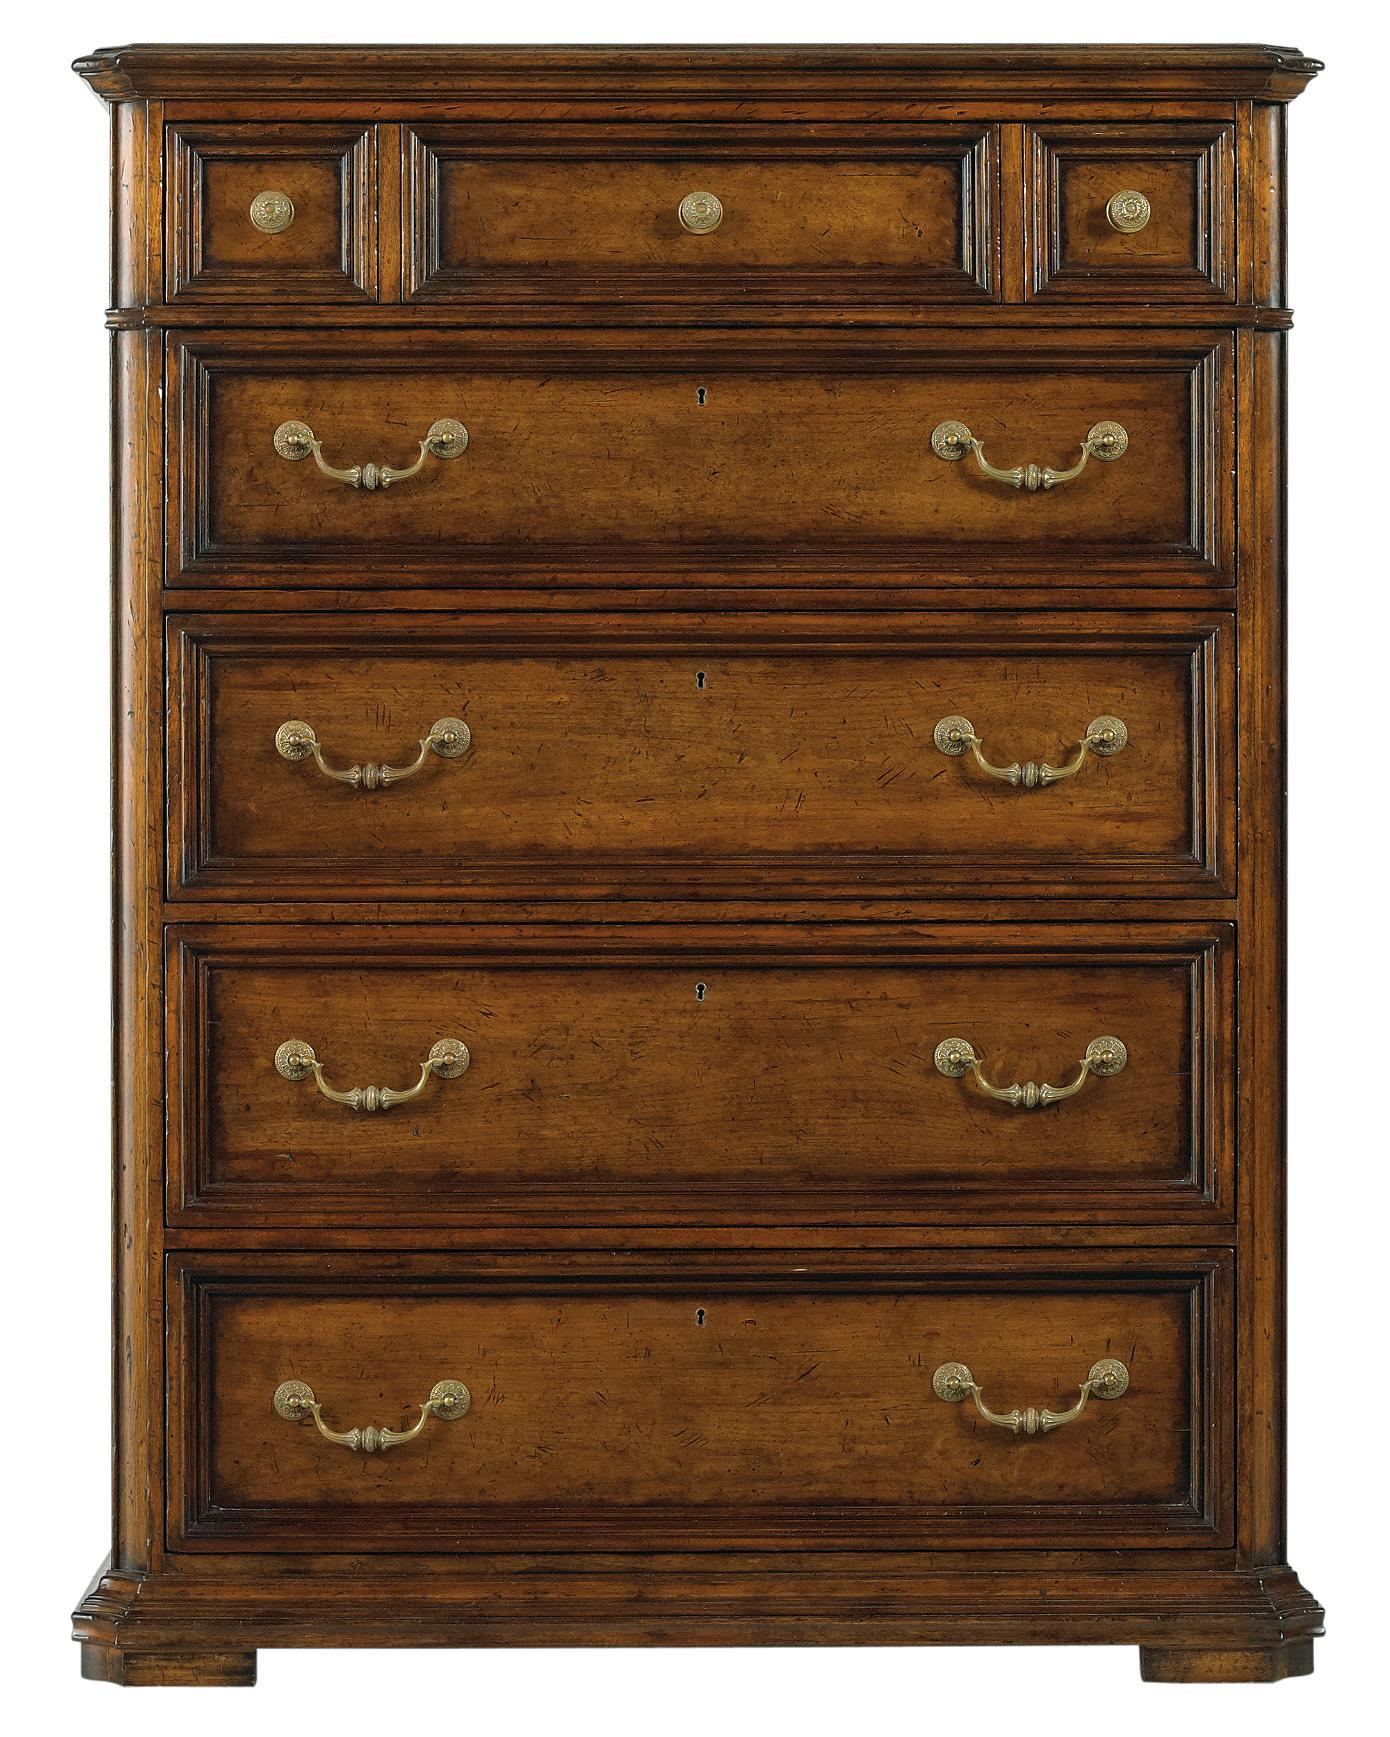 Stanley Furniture Arrondissement Grand Rue Drawer Chest - Item Number: 222-13-10